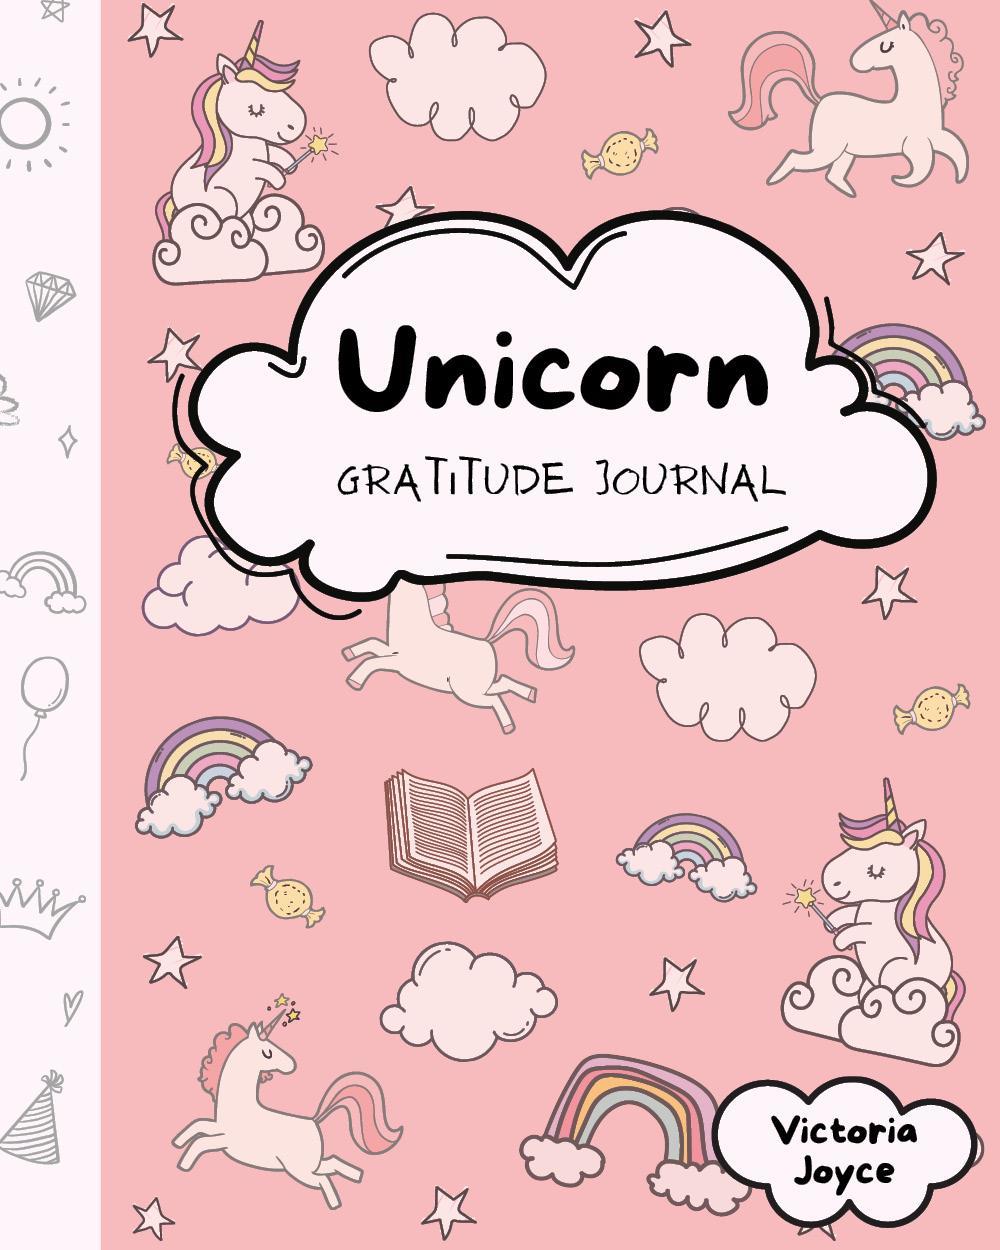 Unicorn Gratitude Journal